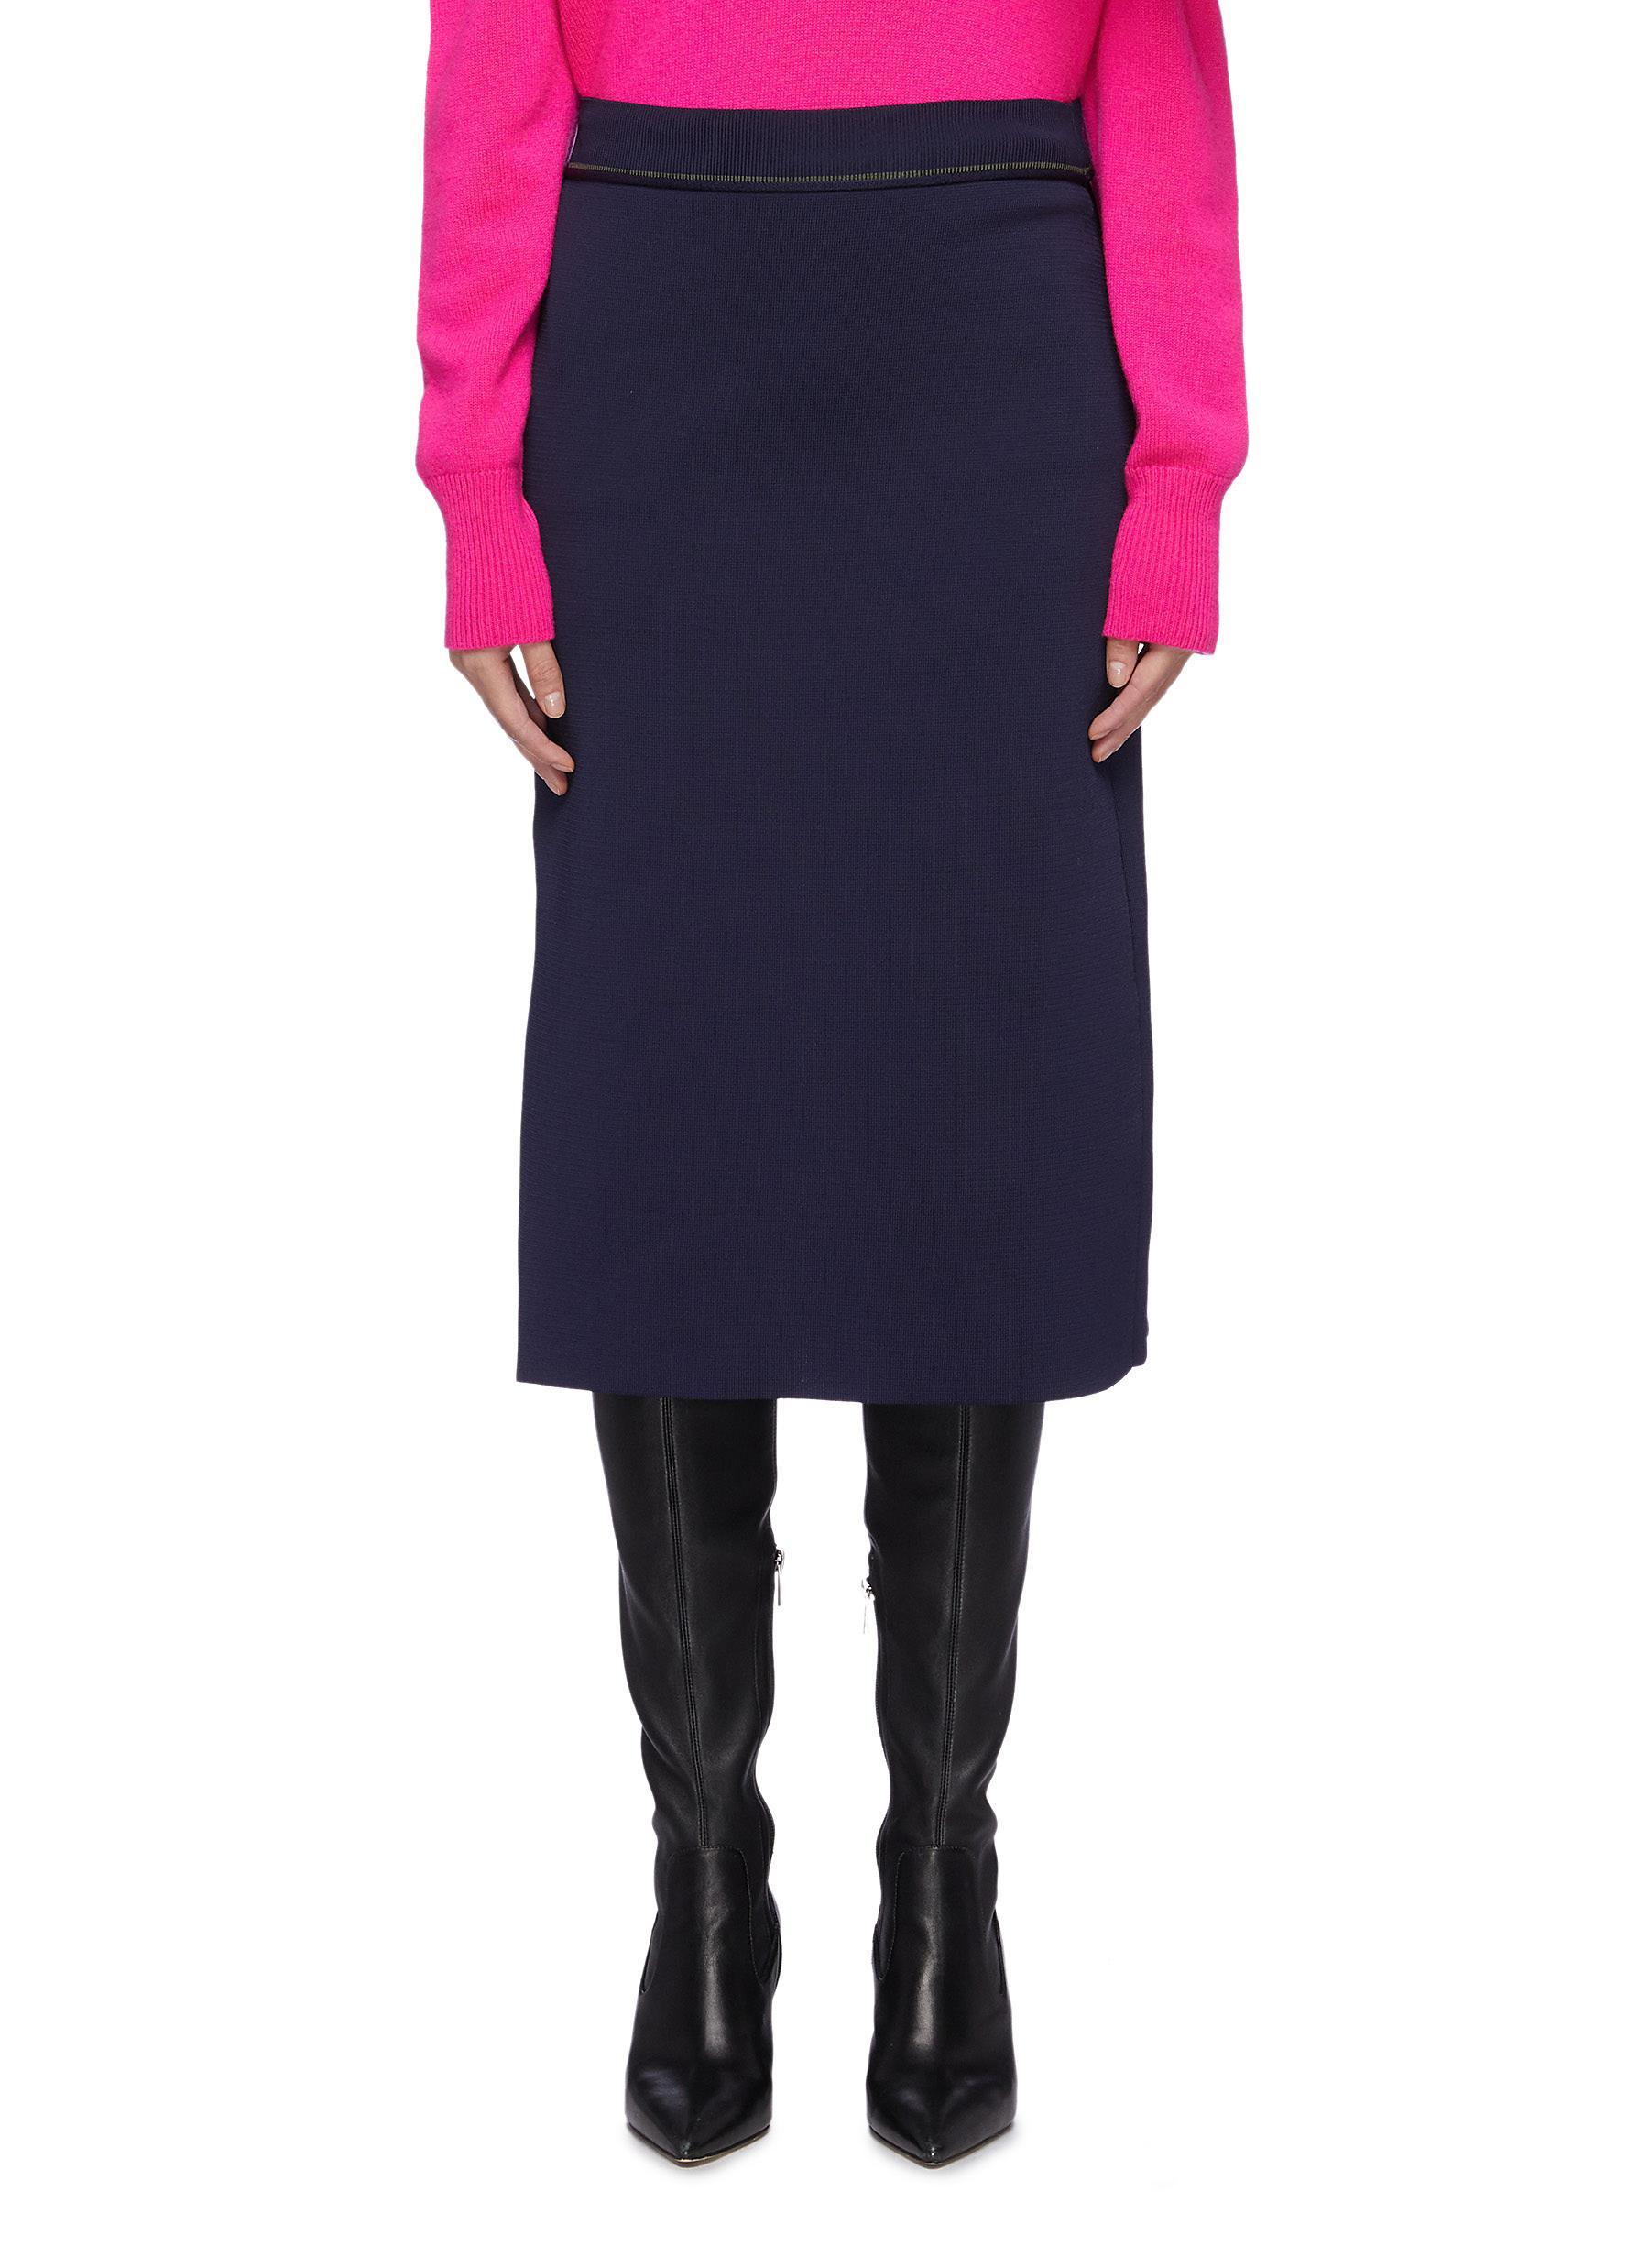 Split back hem colourblock panel knit skirt by Victoria Beckham